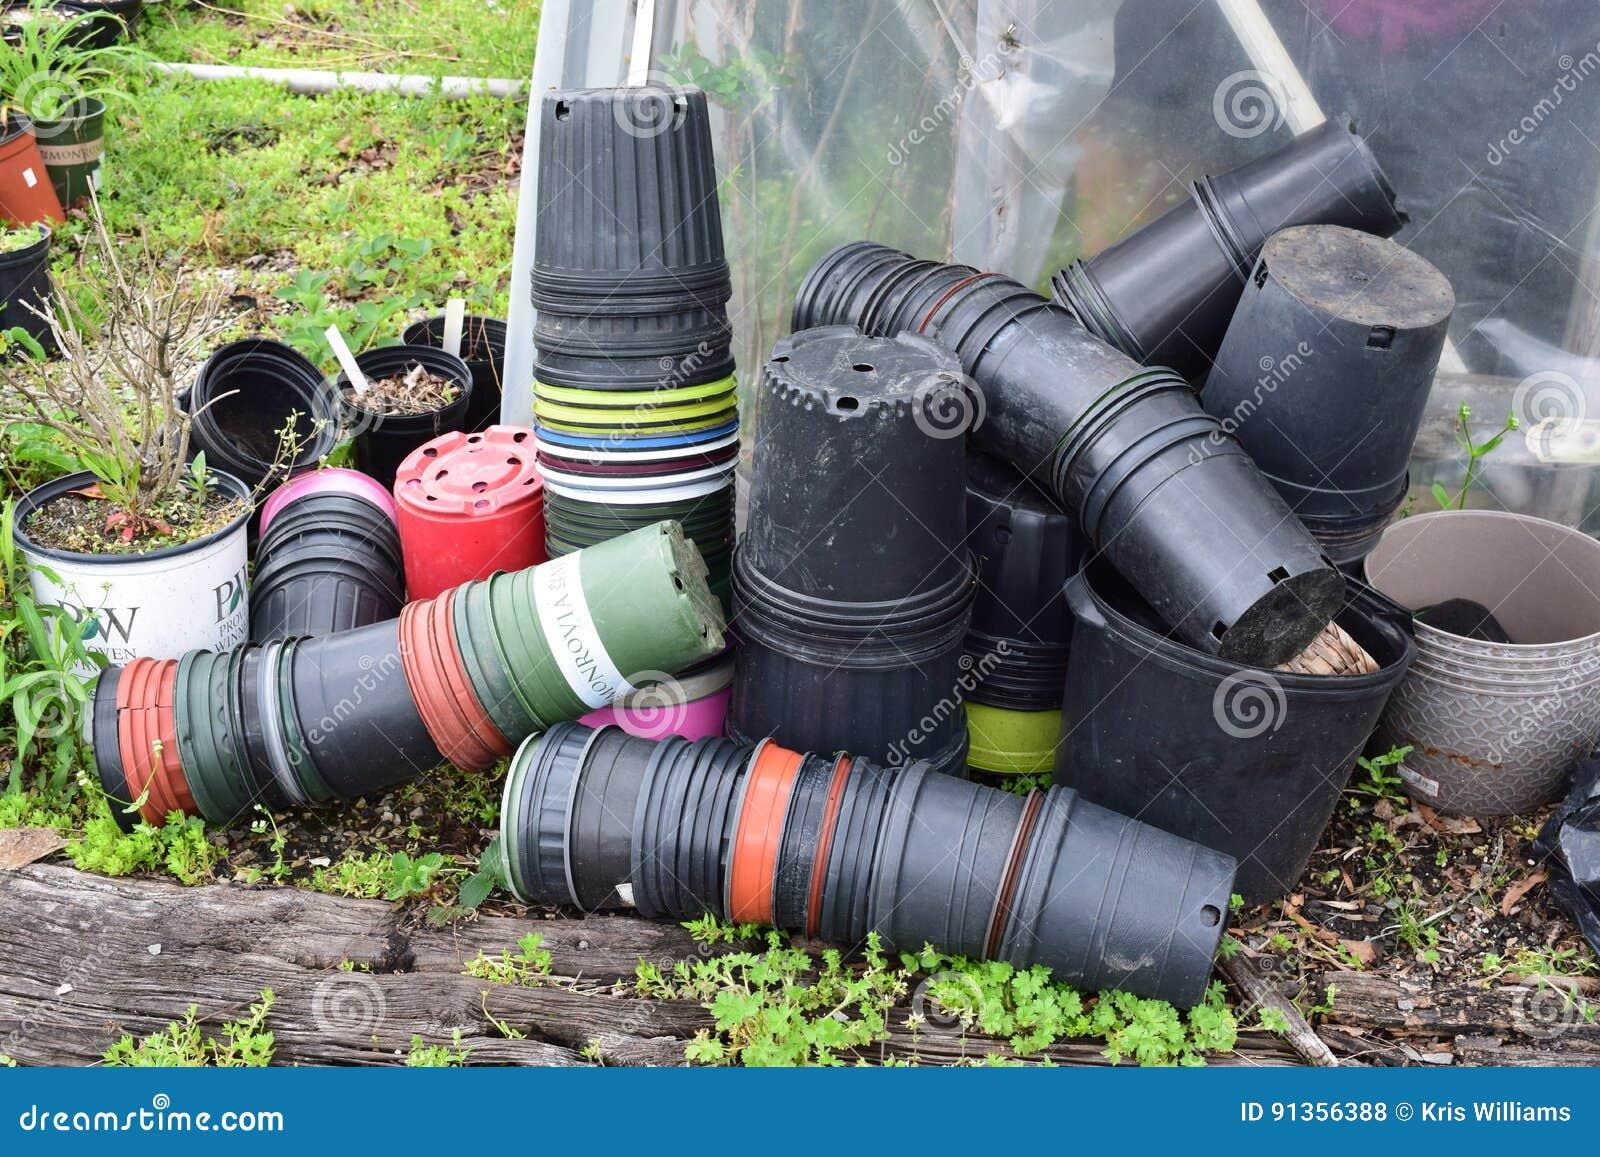 Gardeners pot collection